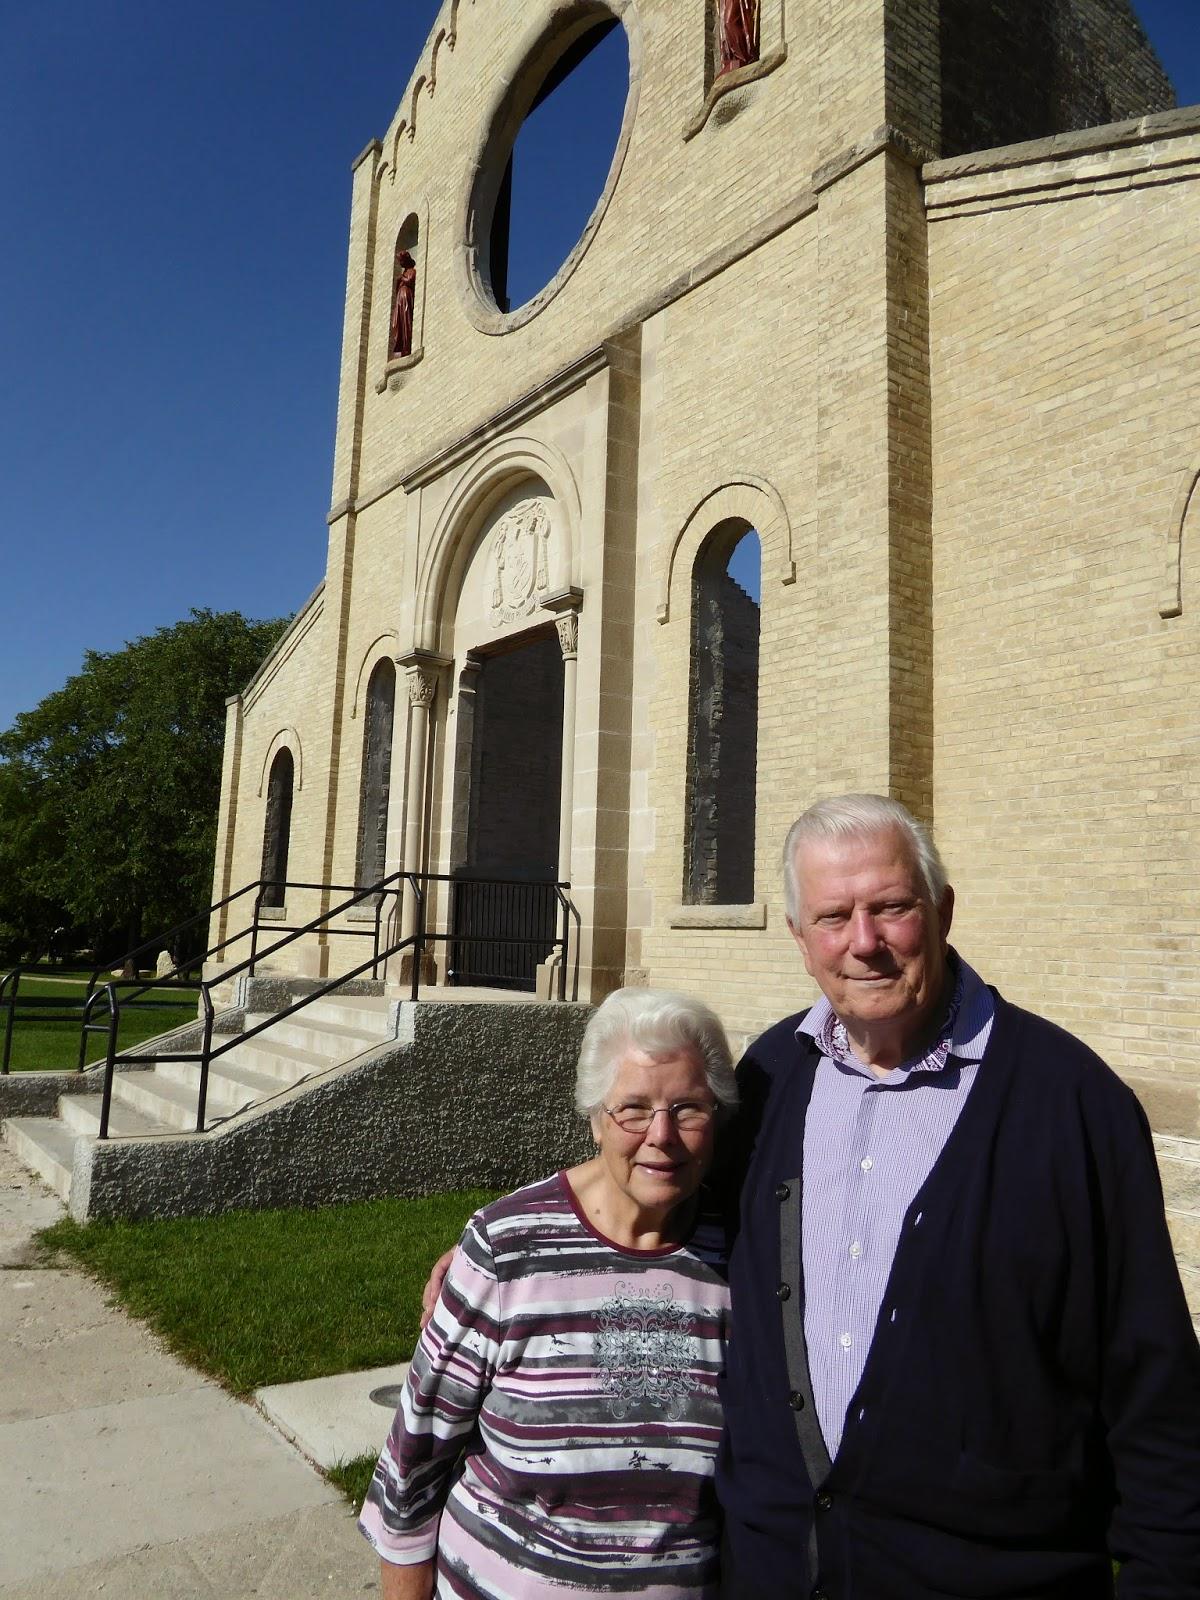 Bill & Shirley Loewen: Philanthropists, Advocates, Volunteers, and Community Leaders